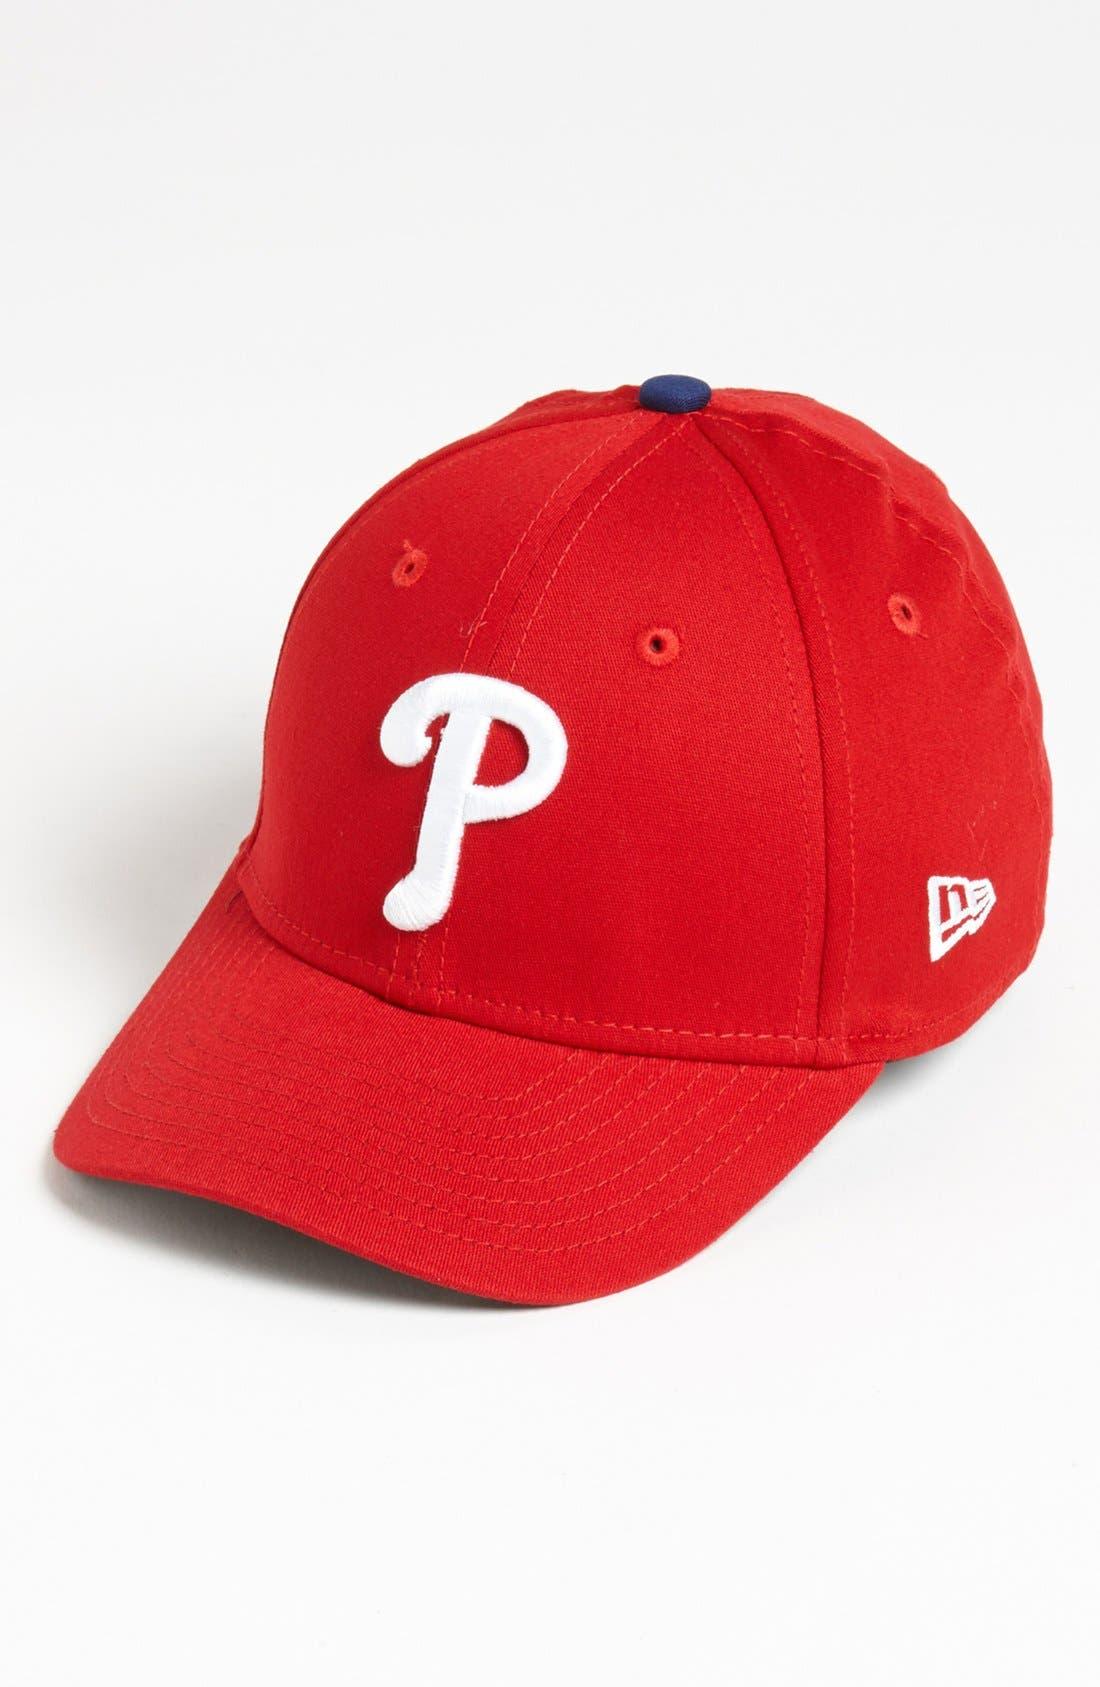 Alternate Image 1 Selected - New Era Cap 'Philadelphia Phillies - Tie Breaker' Baseball Cap (Big Boys)